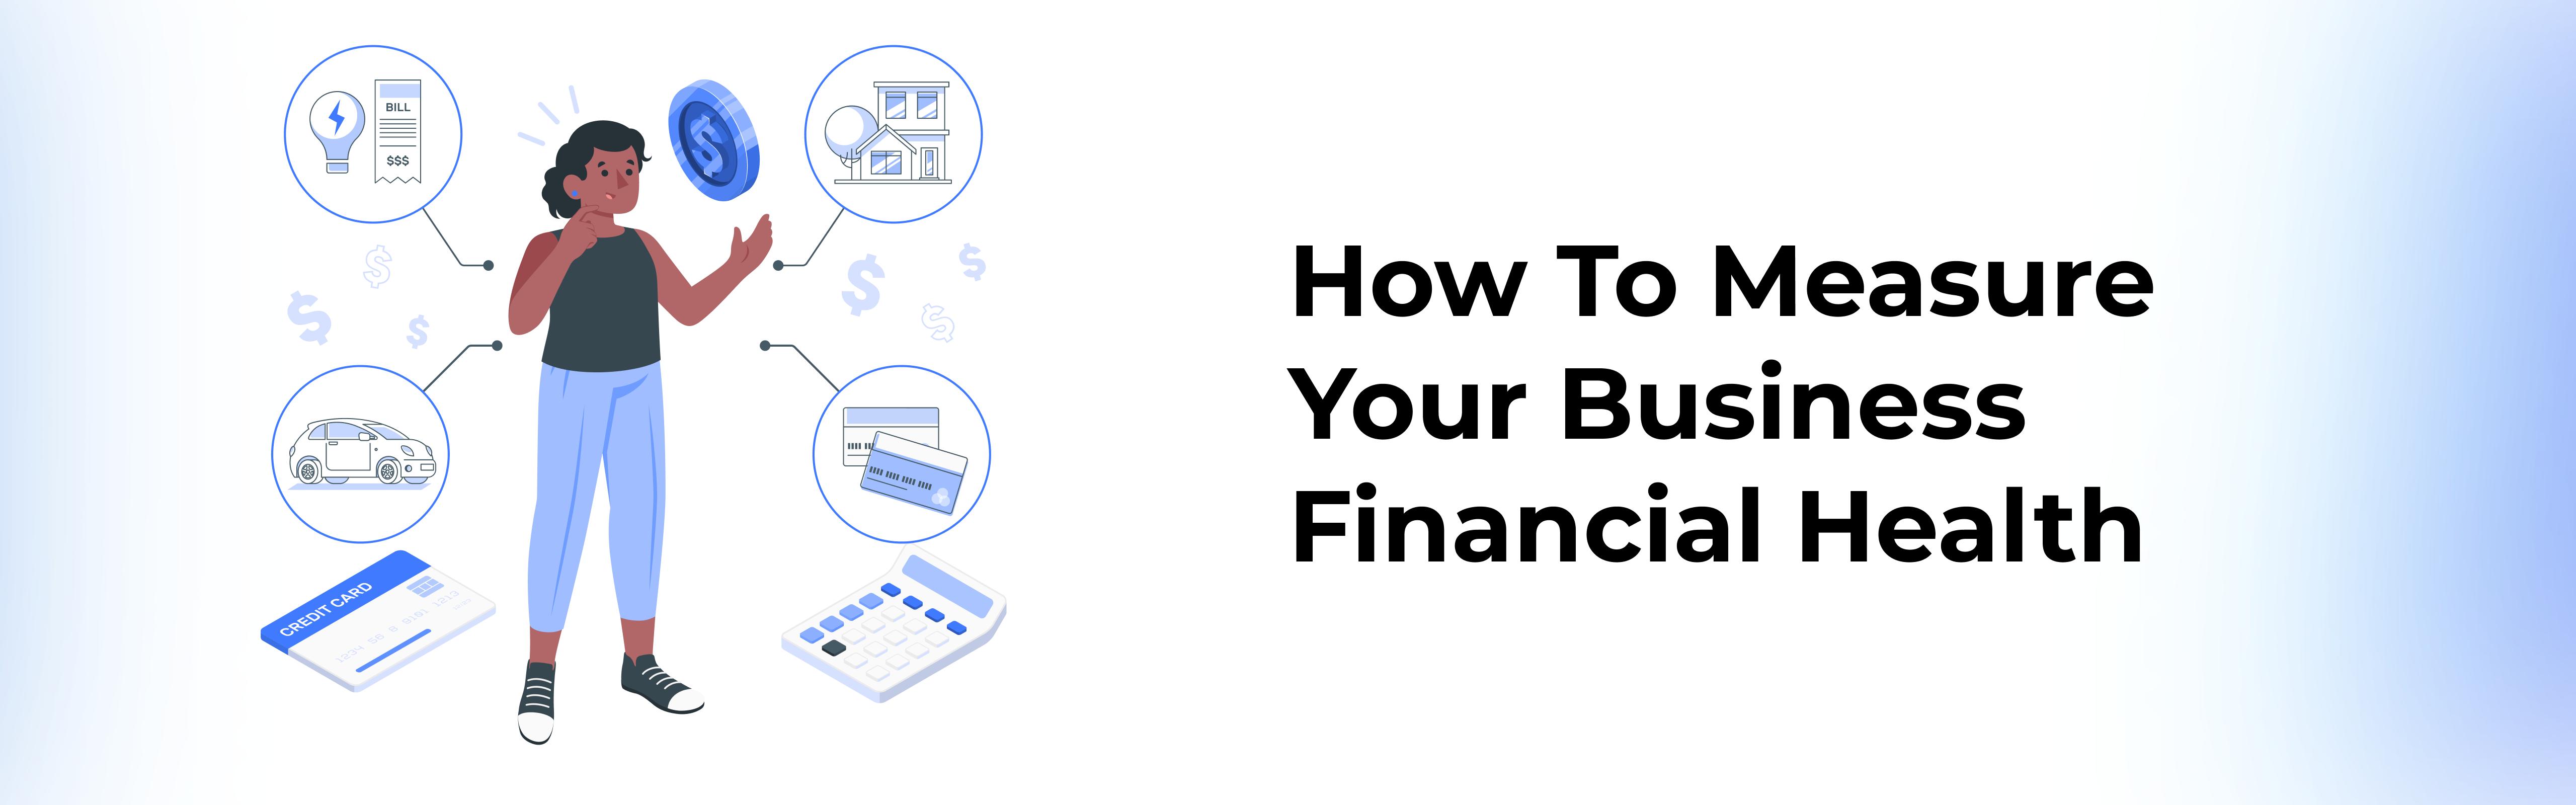 metrics-to-measure-financial-health-of-business